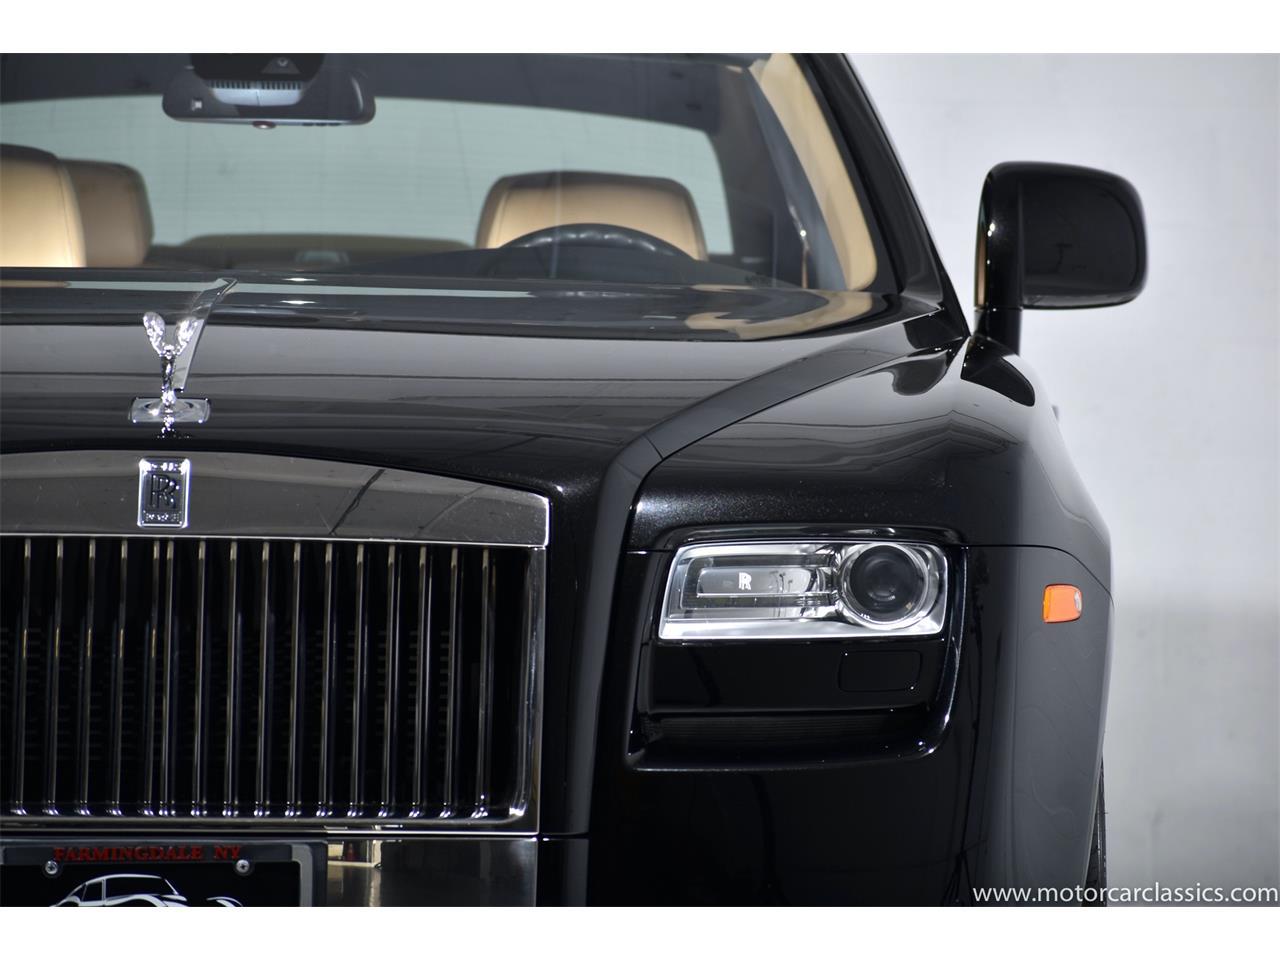 2011 Rolls-Royce Silver Ghost (CC-1409849) for sale in Farmingdale, New York